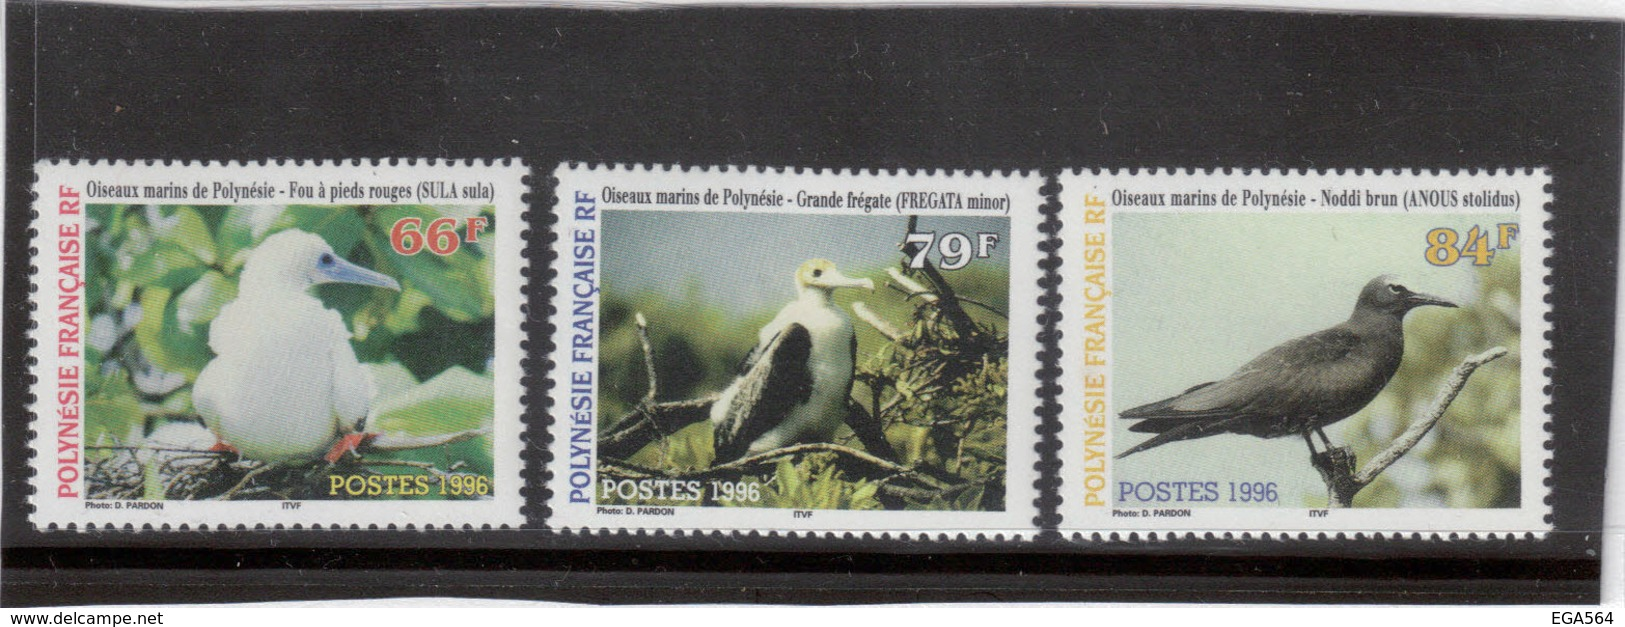 VV6 - POLYNESIE FRANCAISE - PO 510 / 512 ** MNH De 1991 - FAUNE - Oiseaux Marins De Polynésie - Birds - Polinesia Francesa